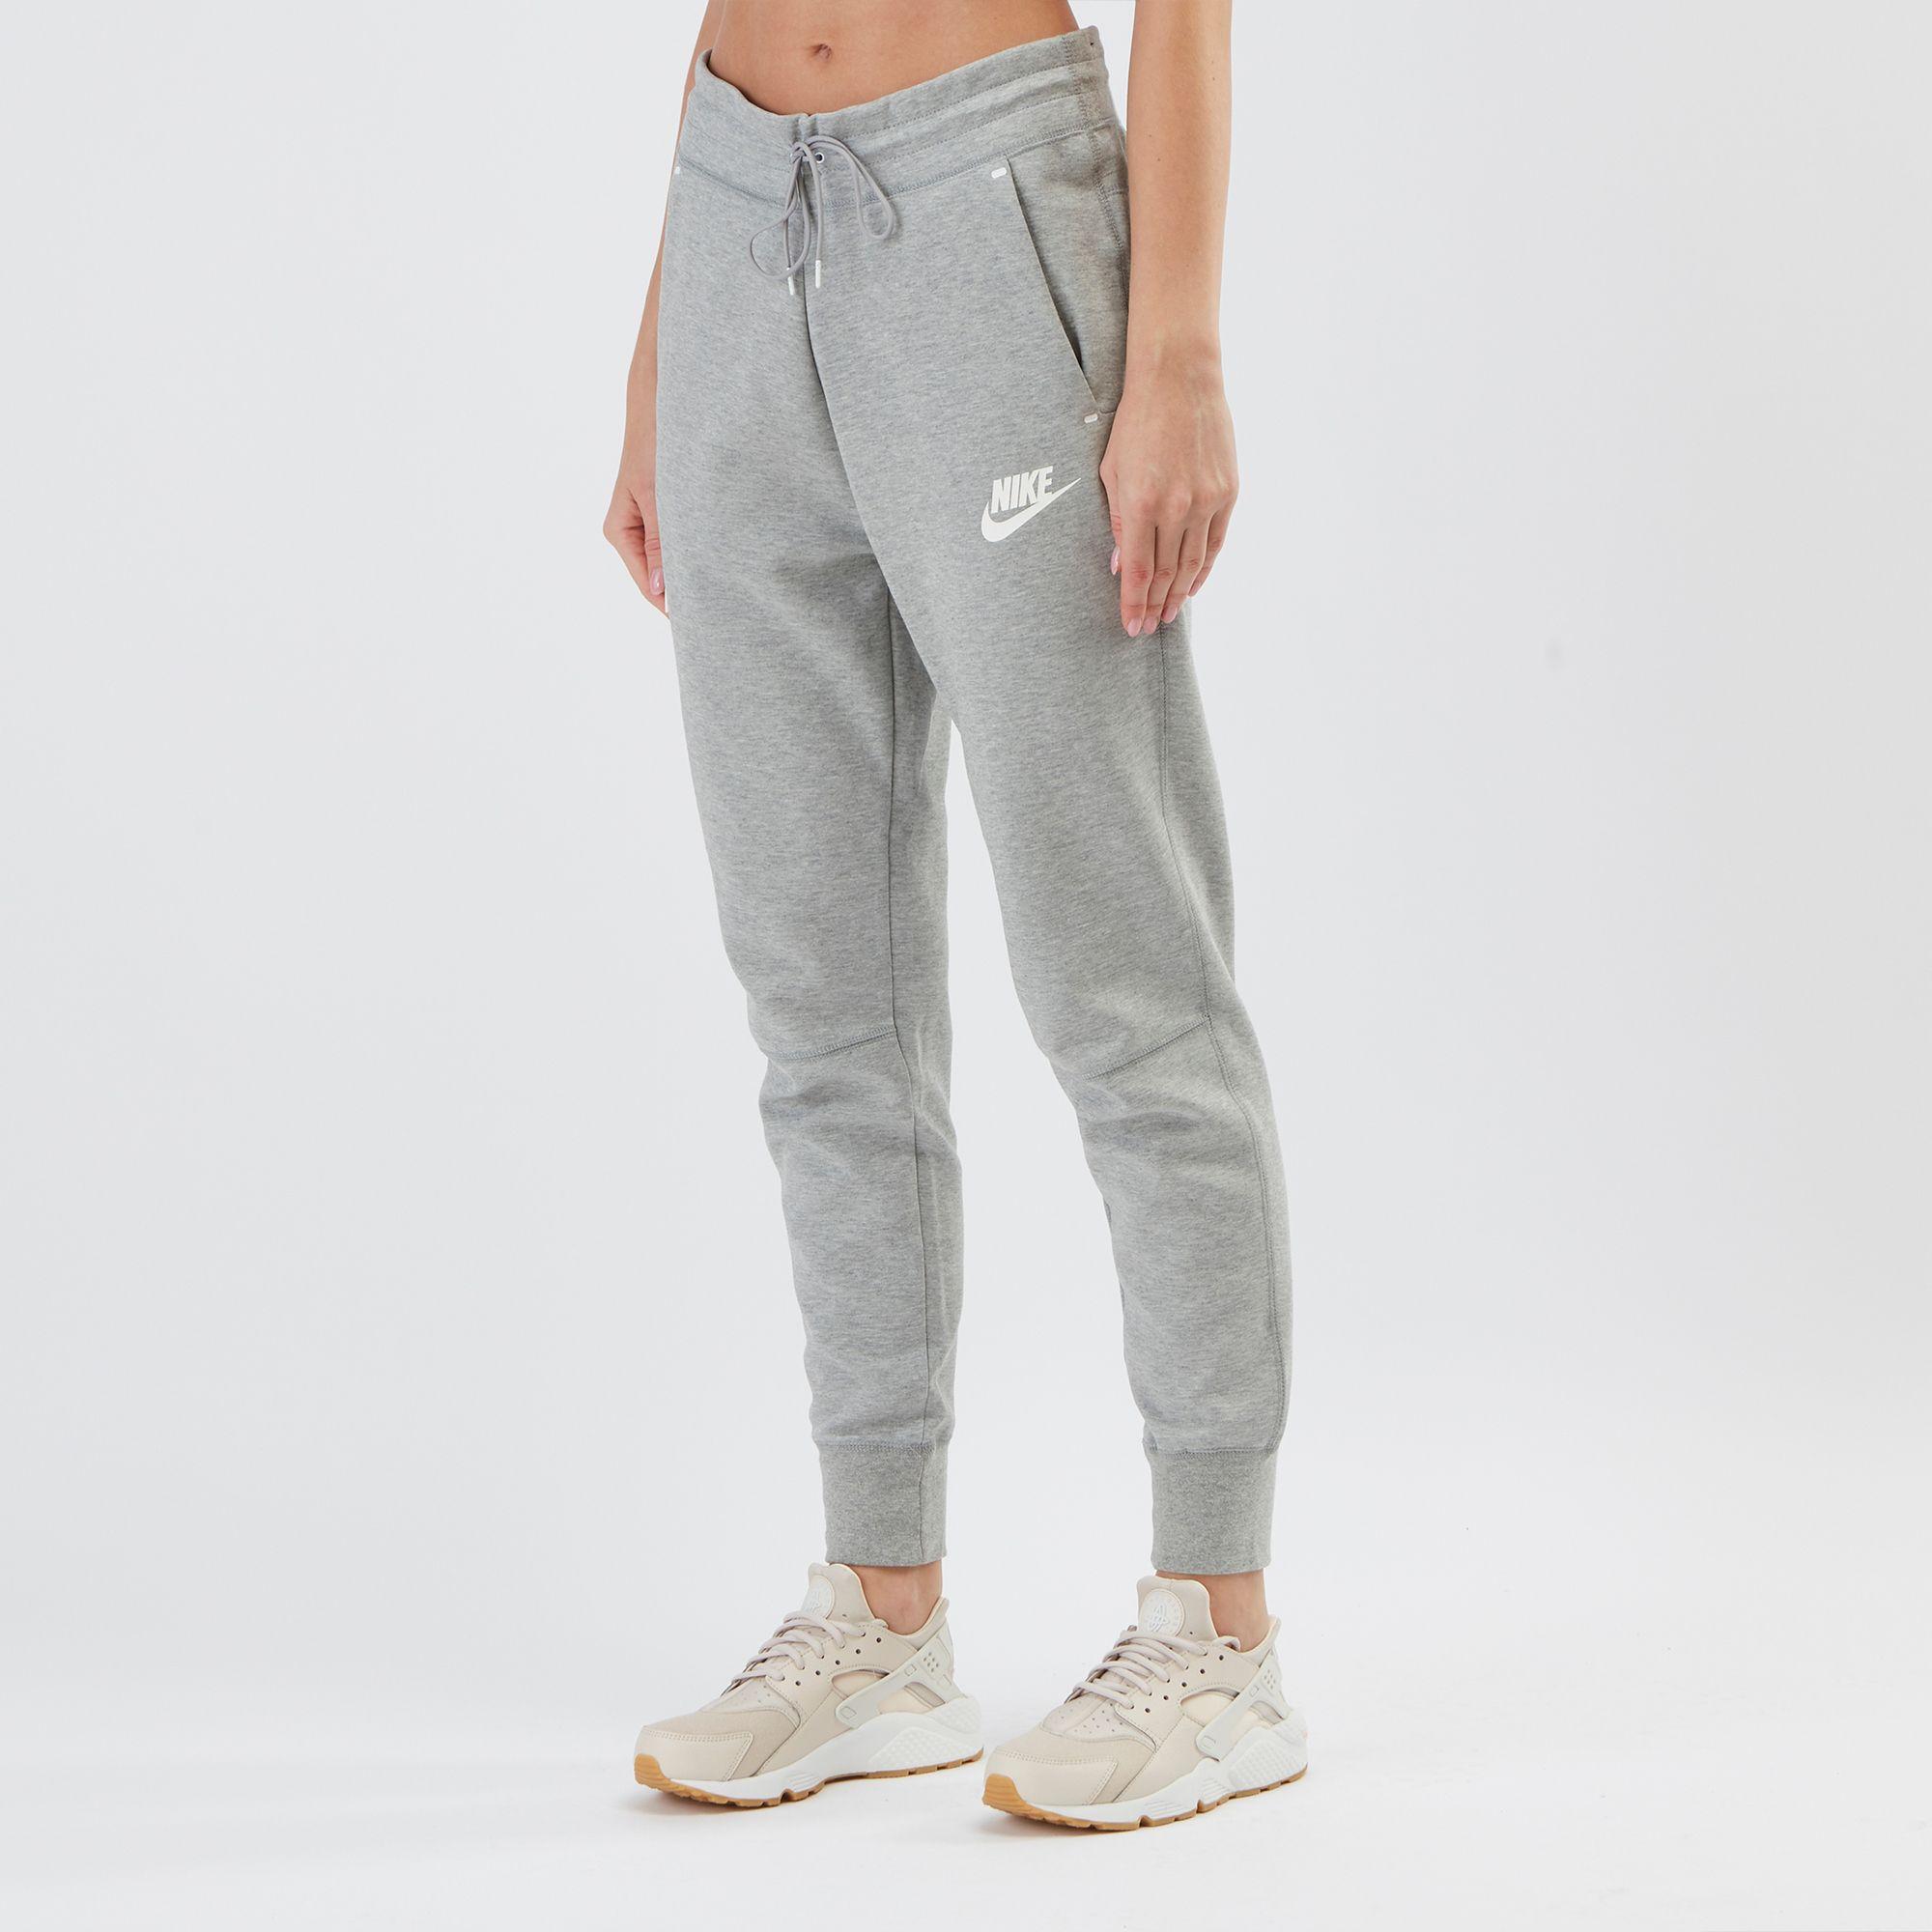 nike sweats grey womens